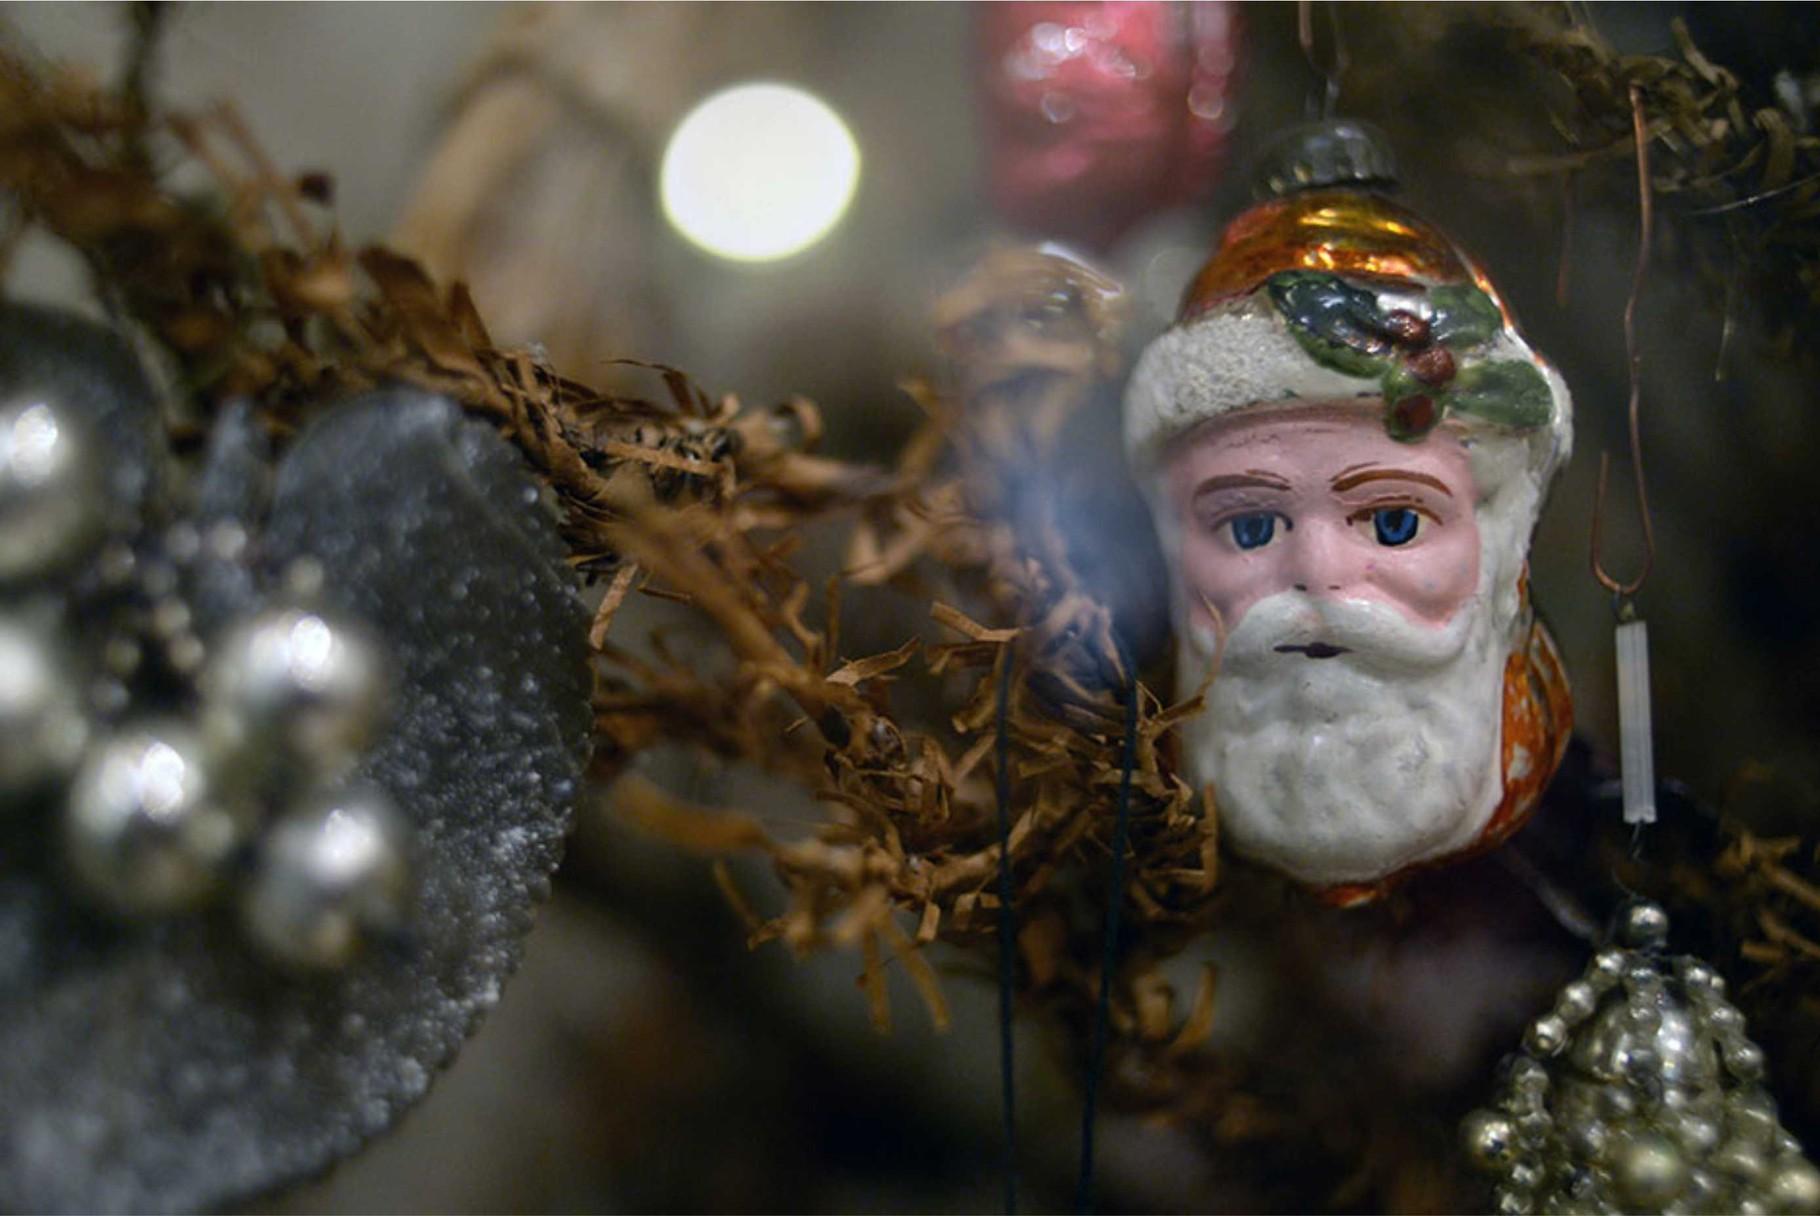 Рождественский дед. Конец XIX - начало XX вв.